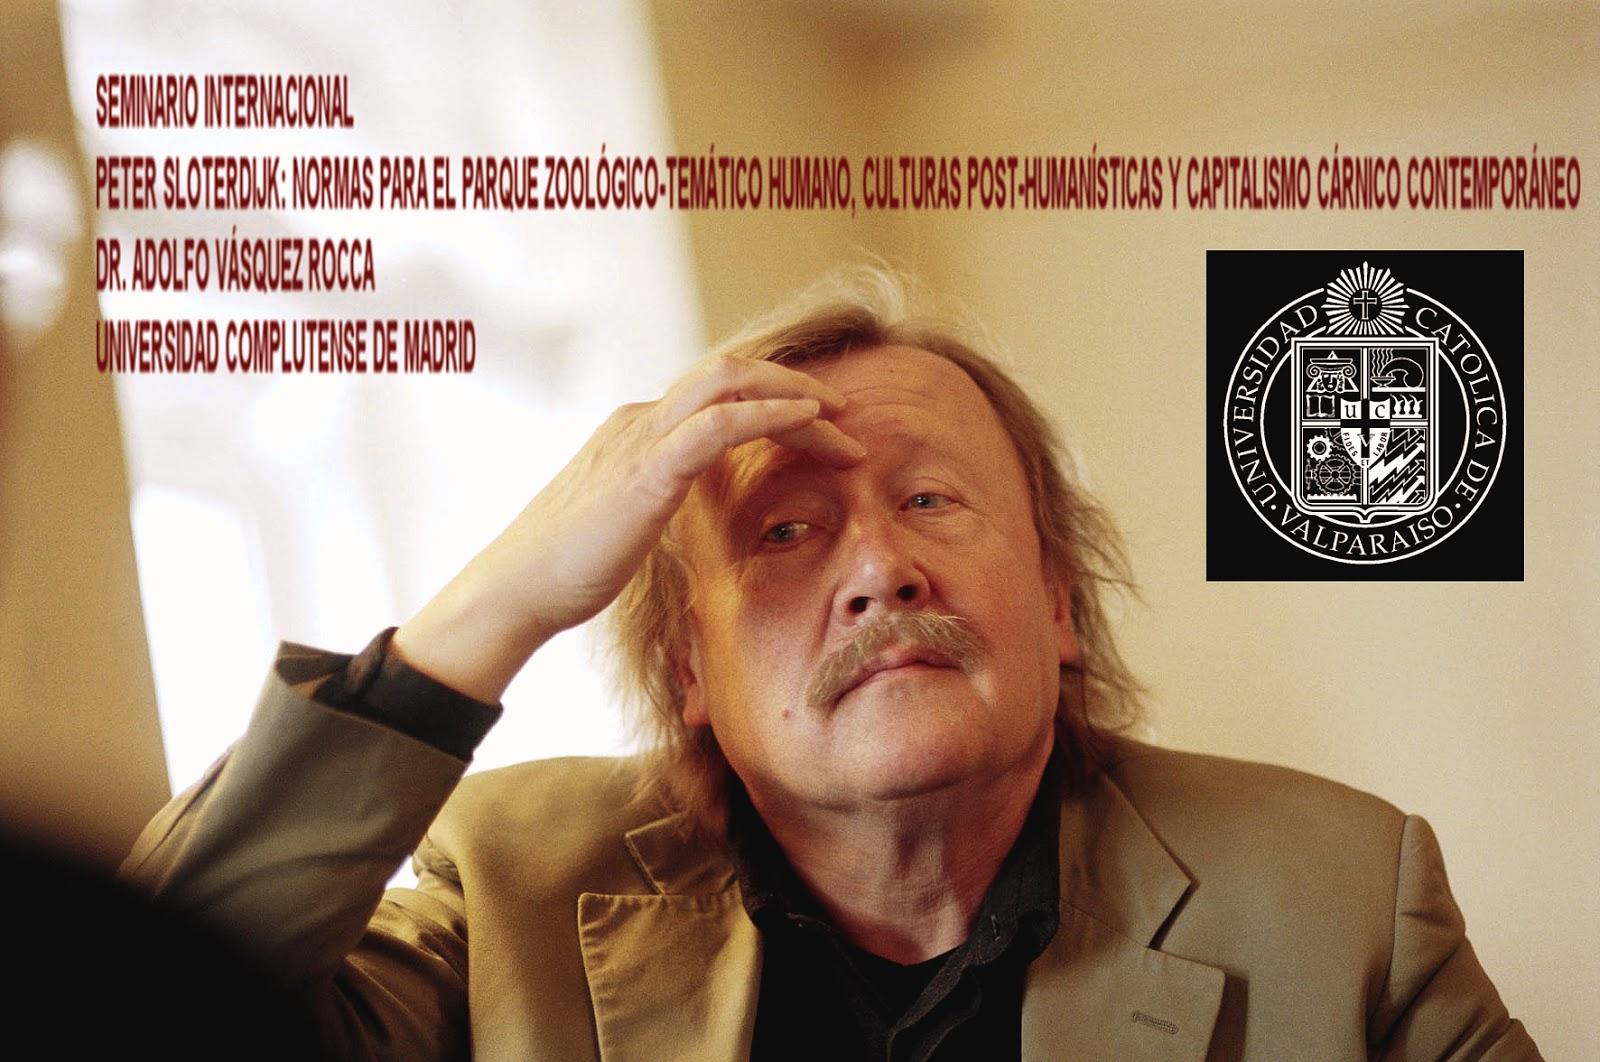 http://2.bp.blogspot.com/-4E0tZy7Ja8Y/UXIAY5pcrlI/AAAAAAAAHHg/6zEyD9v2yTQ/s1600/Peter_Sloterdijk_+por+Adolfo+_+Vasquez+_+Rocca+_+Seminario.jpg